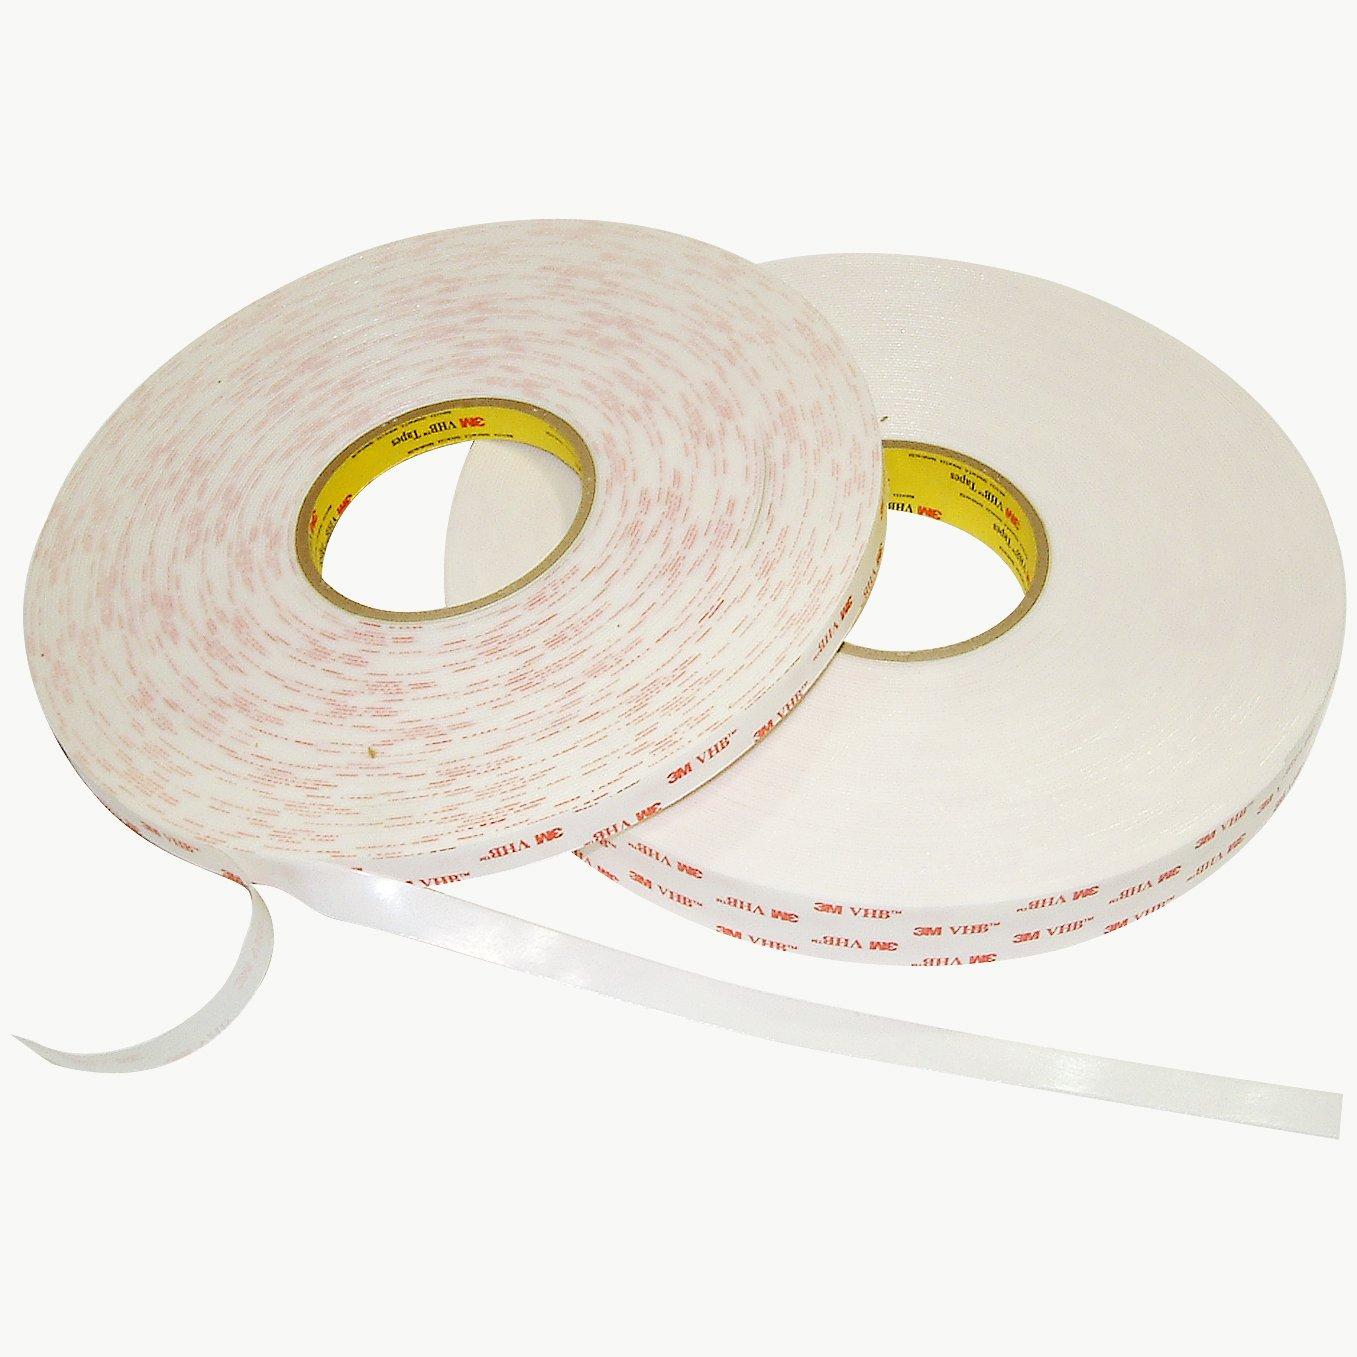 3M 4950/WI15 Scotch 4950 VHB Tape: 1'' x 15 ft, White